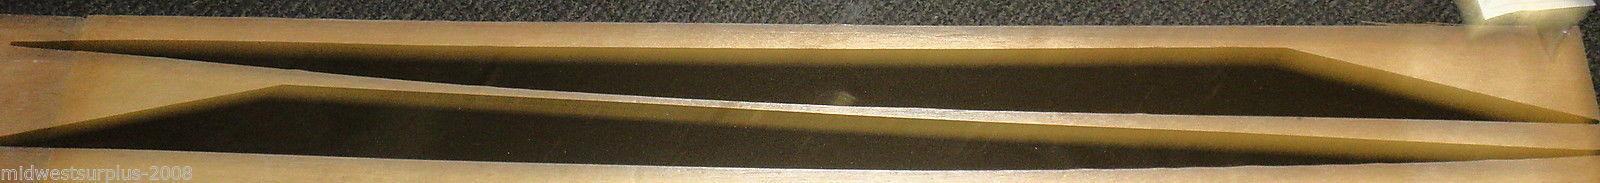 Dutchmen RV Kodiak Side Cut #17 Brown Decal Set #DUT1351342C17RH/DUT1351342C17LH